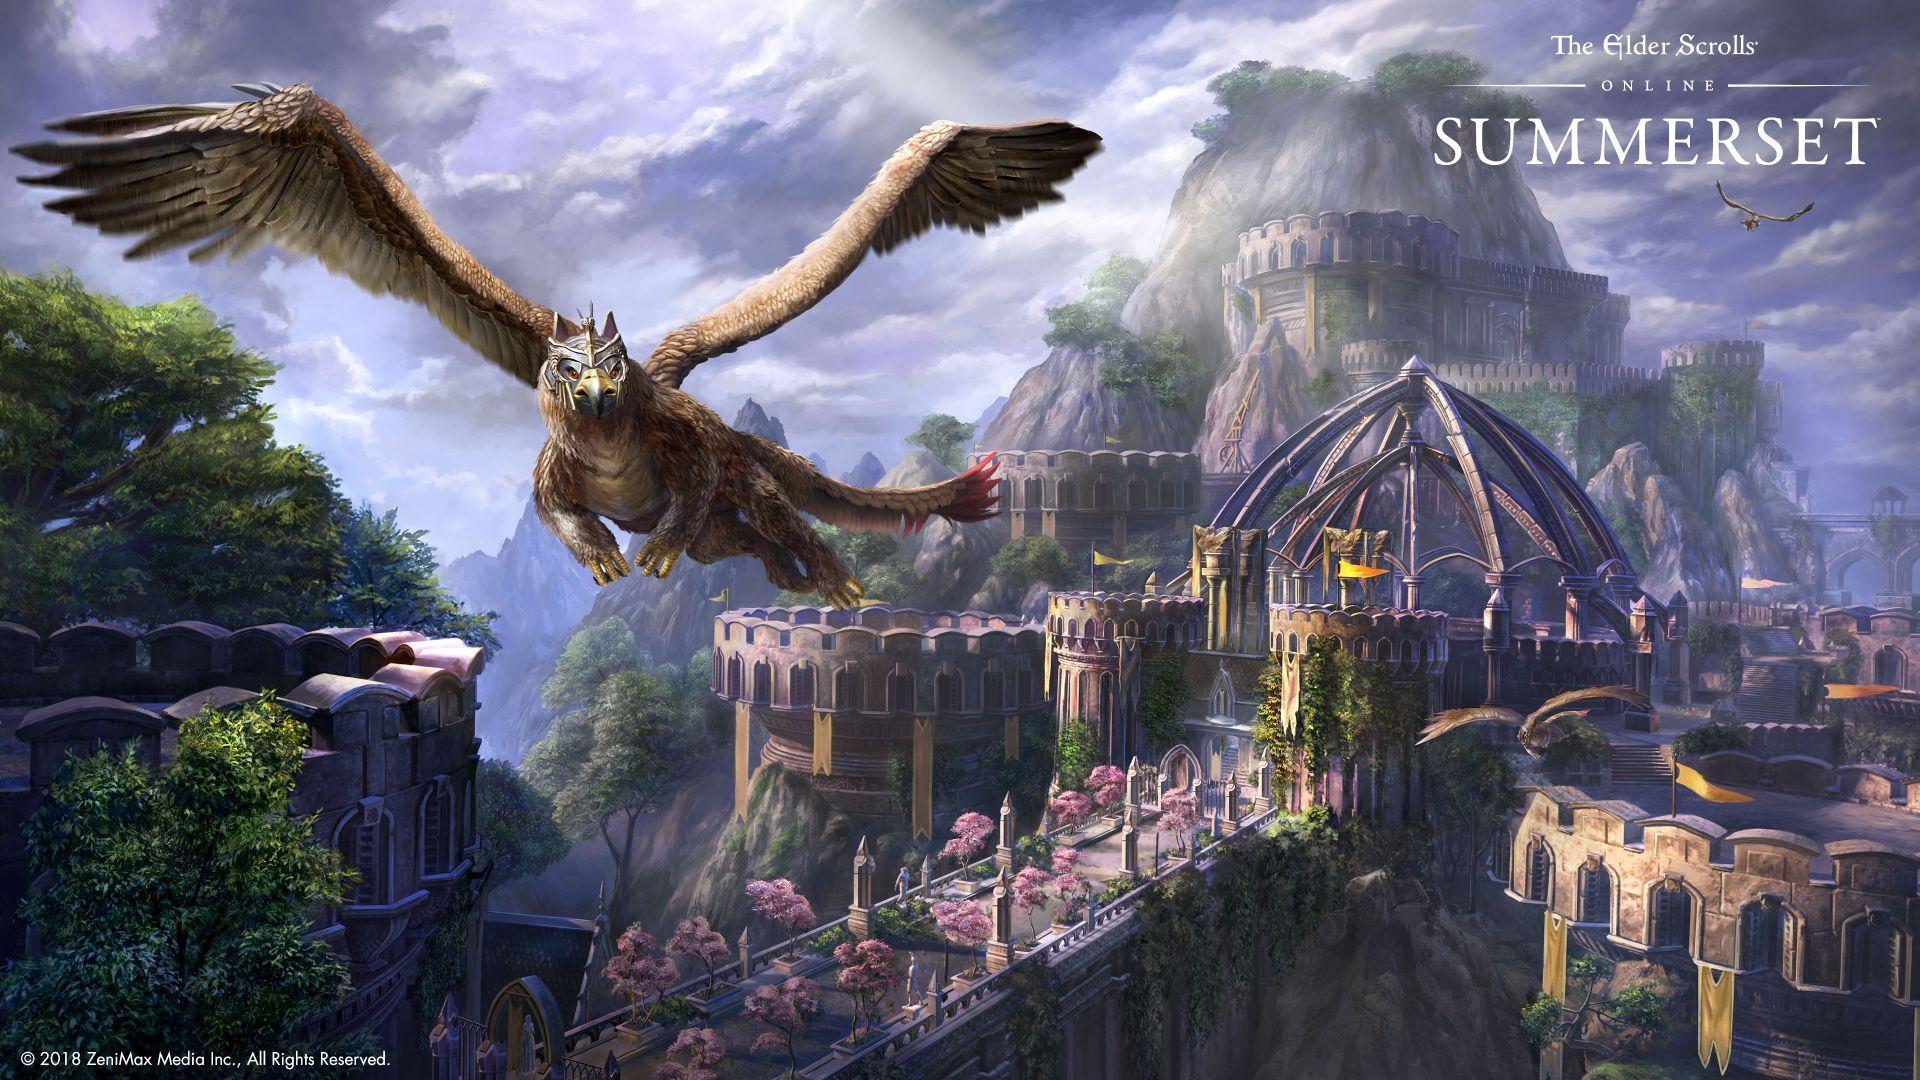 Wallpaper The Elder Scrolls Online Summerset Poster 4k Games 18743 Elder Scrolls Art Elder Scrolls Online Elder Scrolls